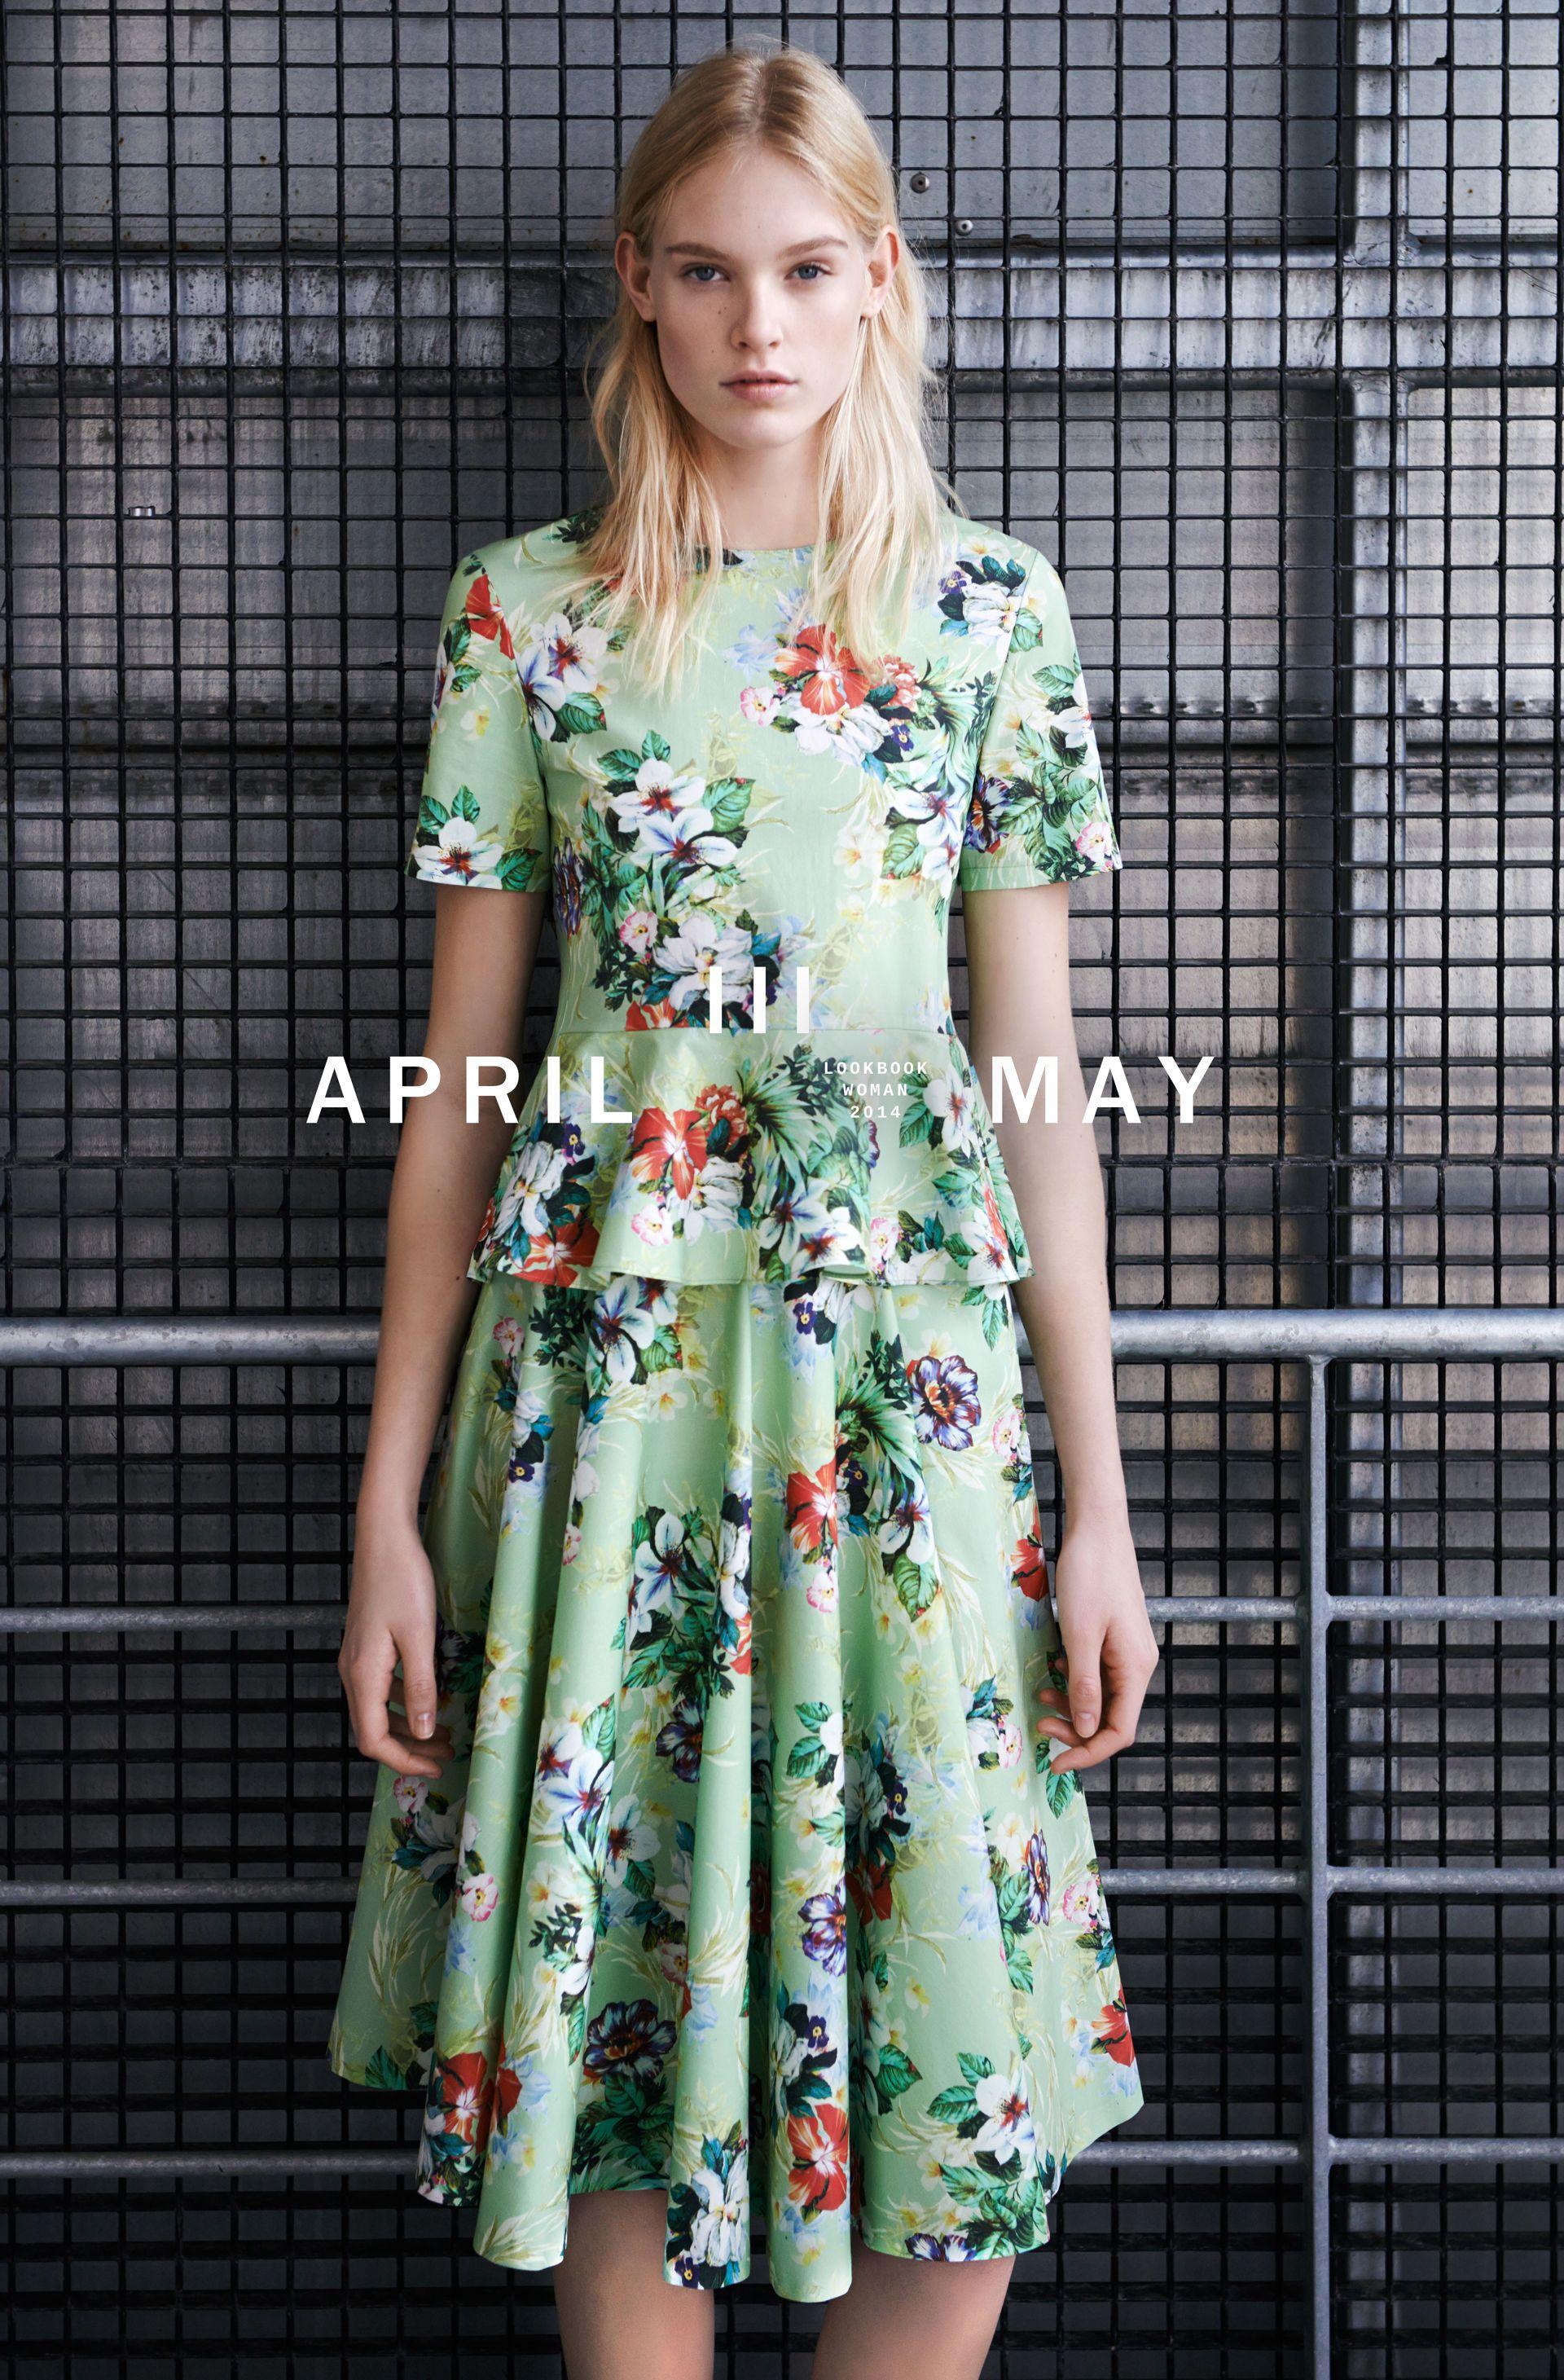 April zara lookbook